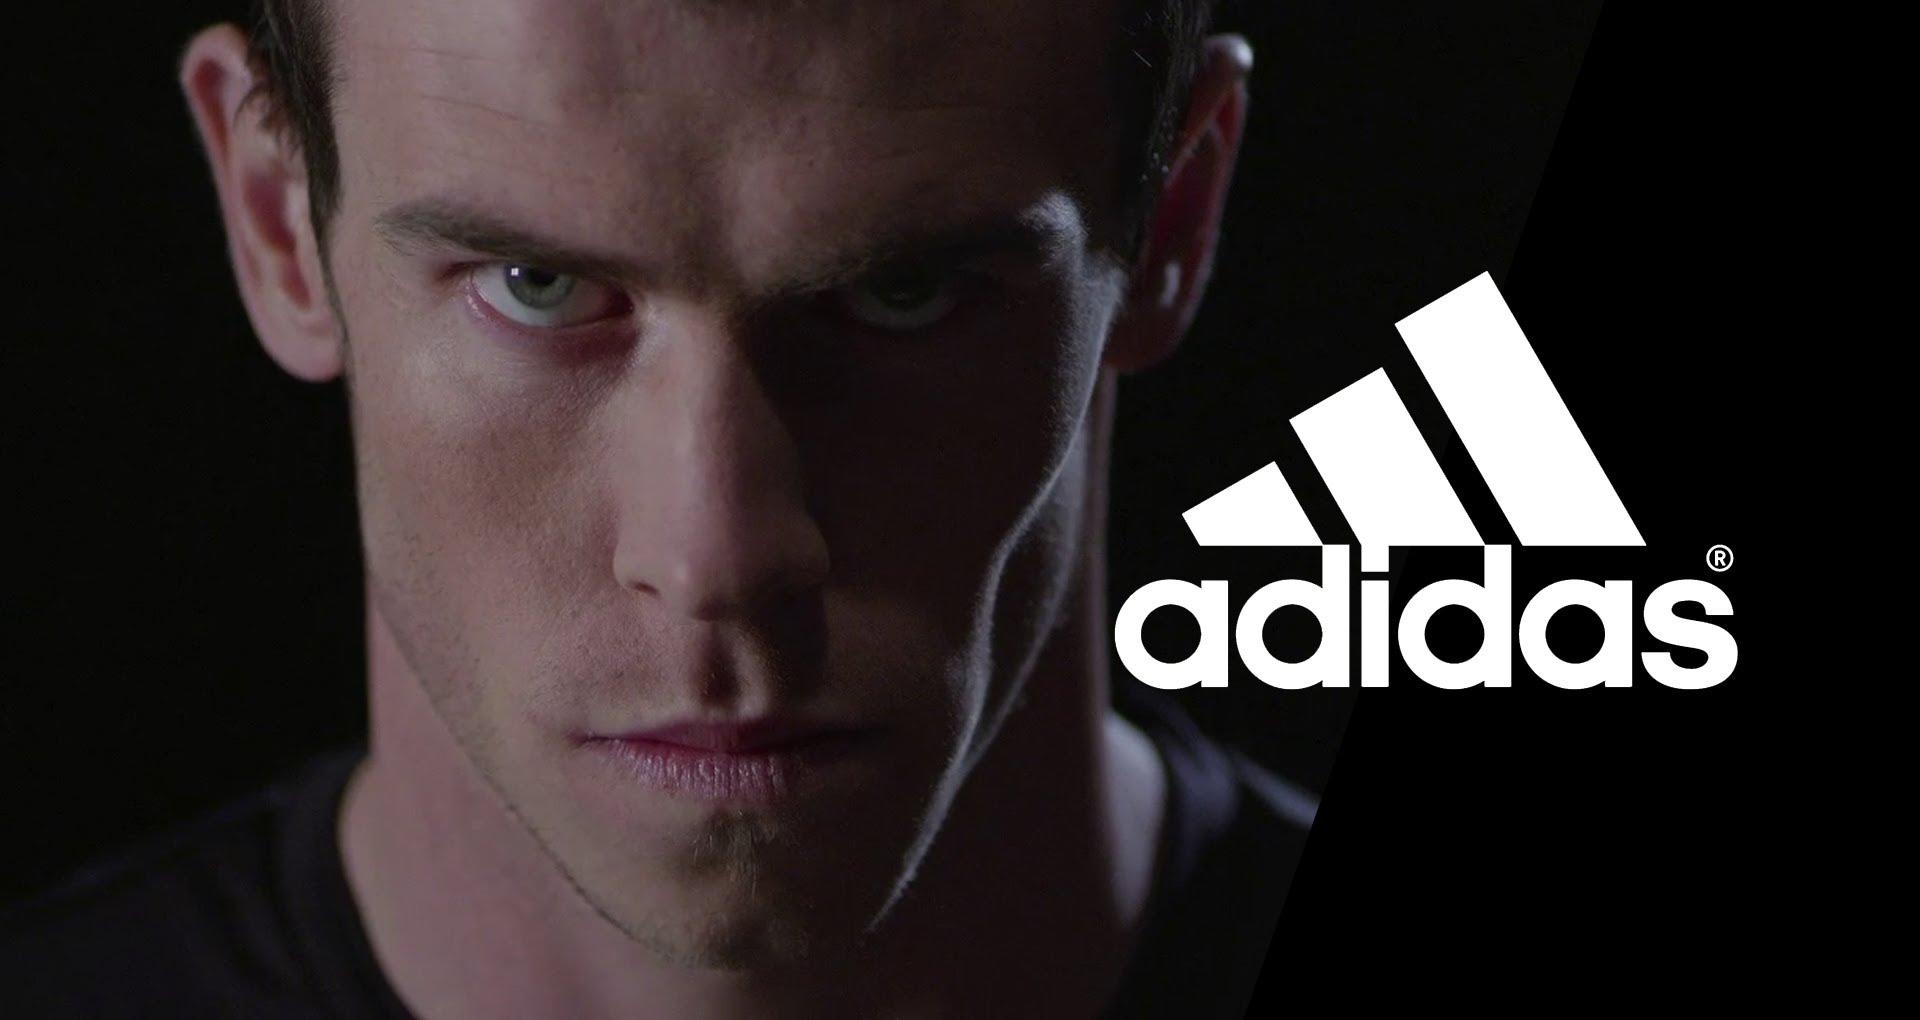 Gareth Bale Wallpaper Adidas